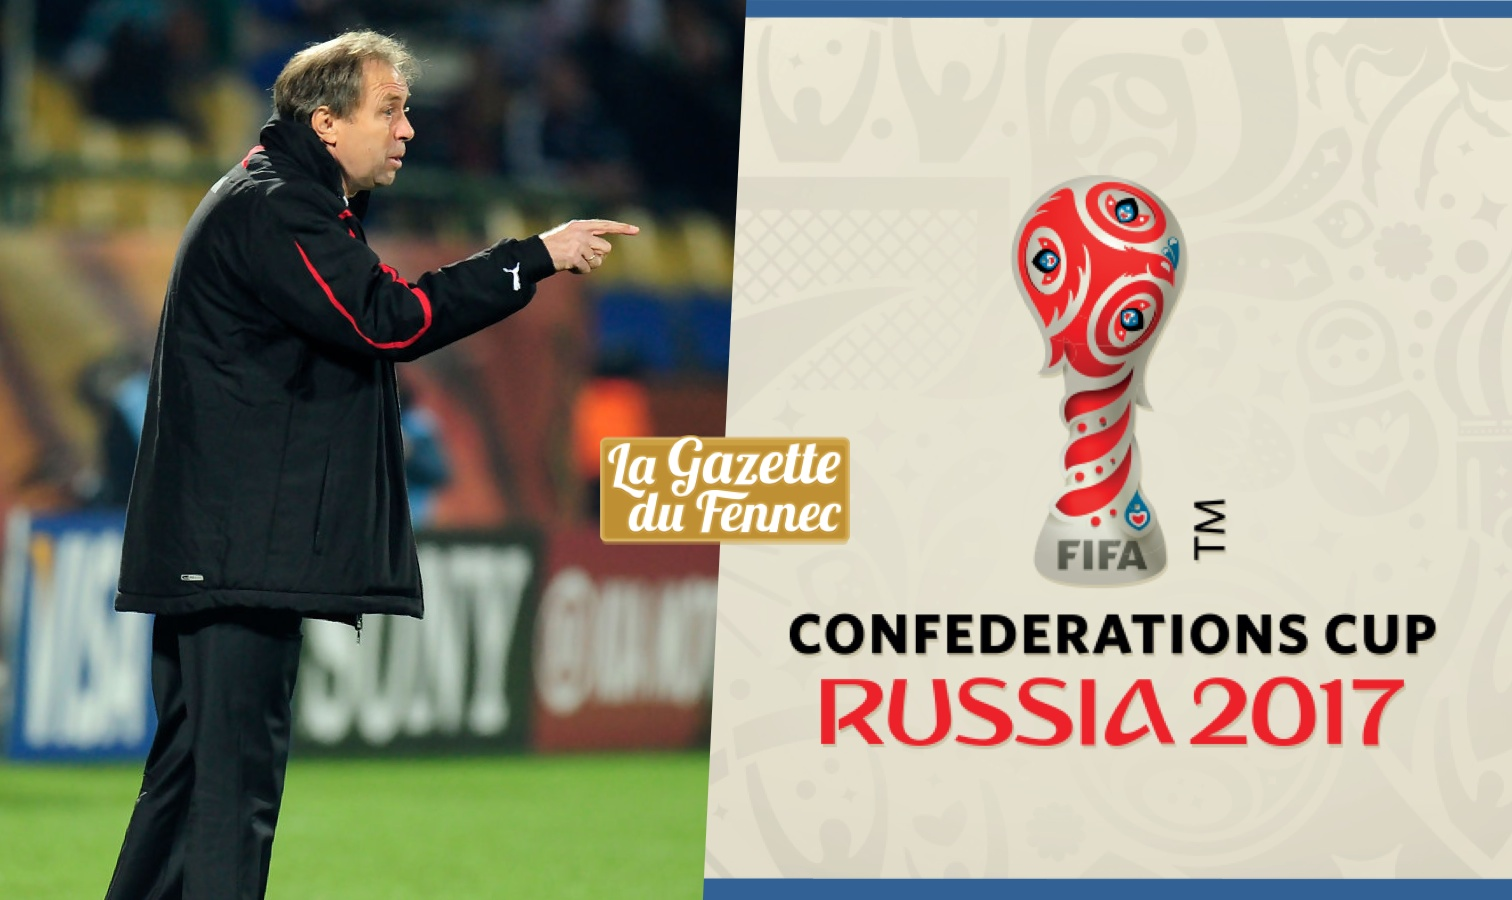 confederations cup rajevac